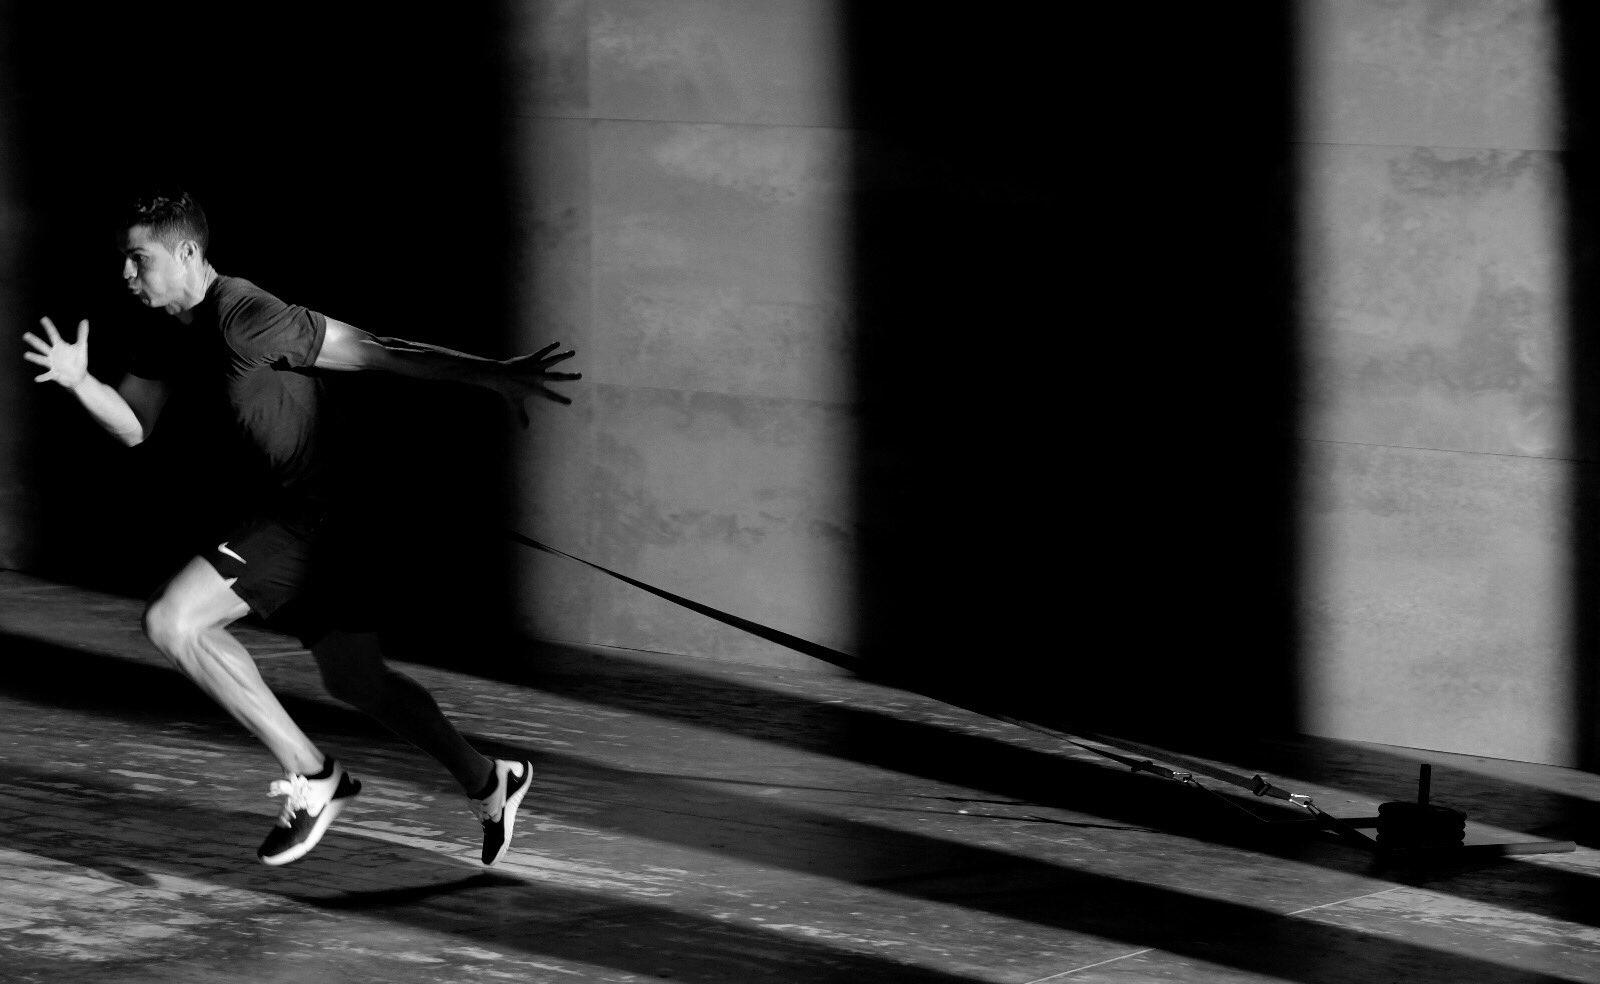 My secret is dedication. �� @CR7CrunchFitnes #LiveLifeFit #Fitness https://t.co/NFqlXTe3O2